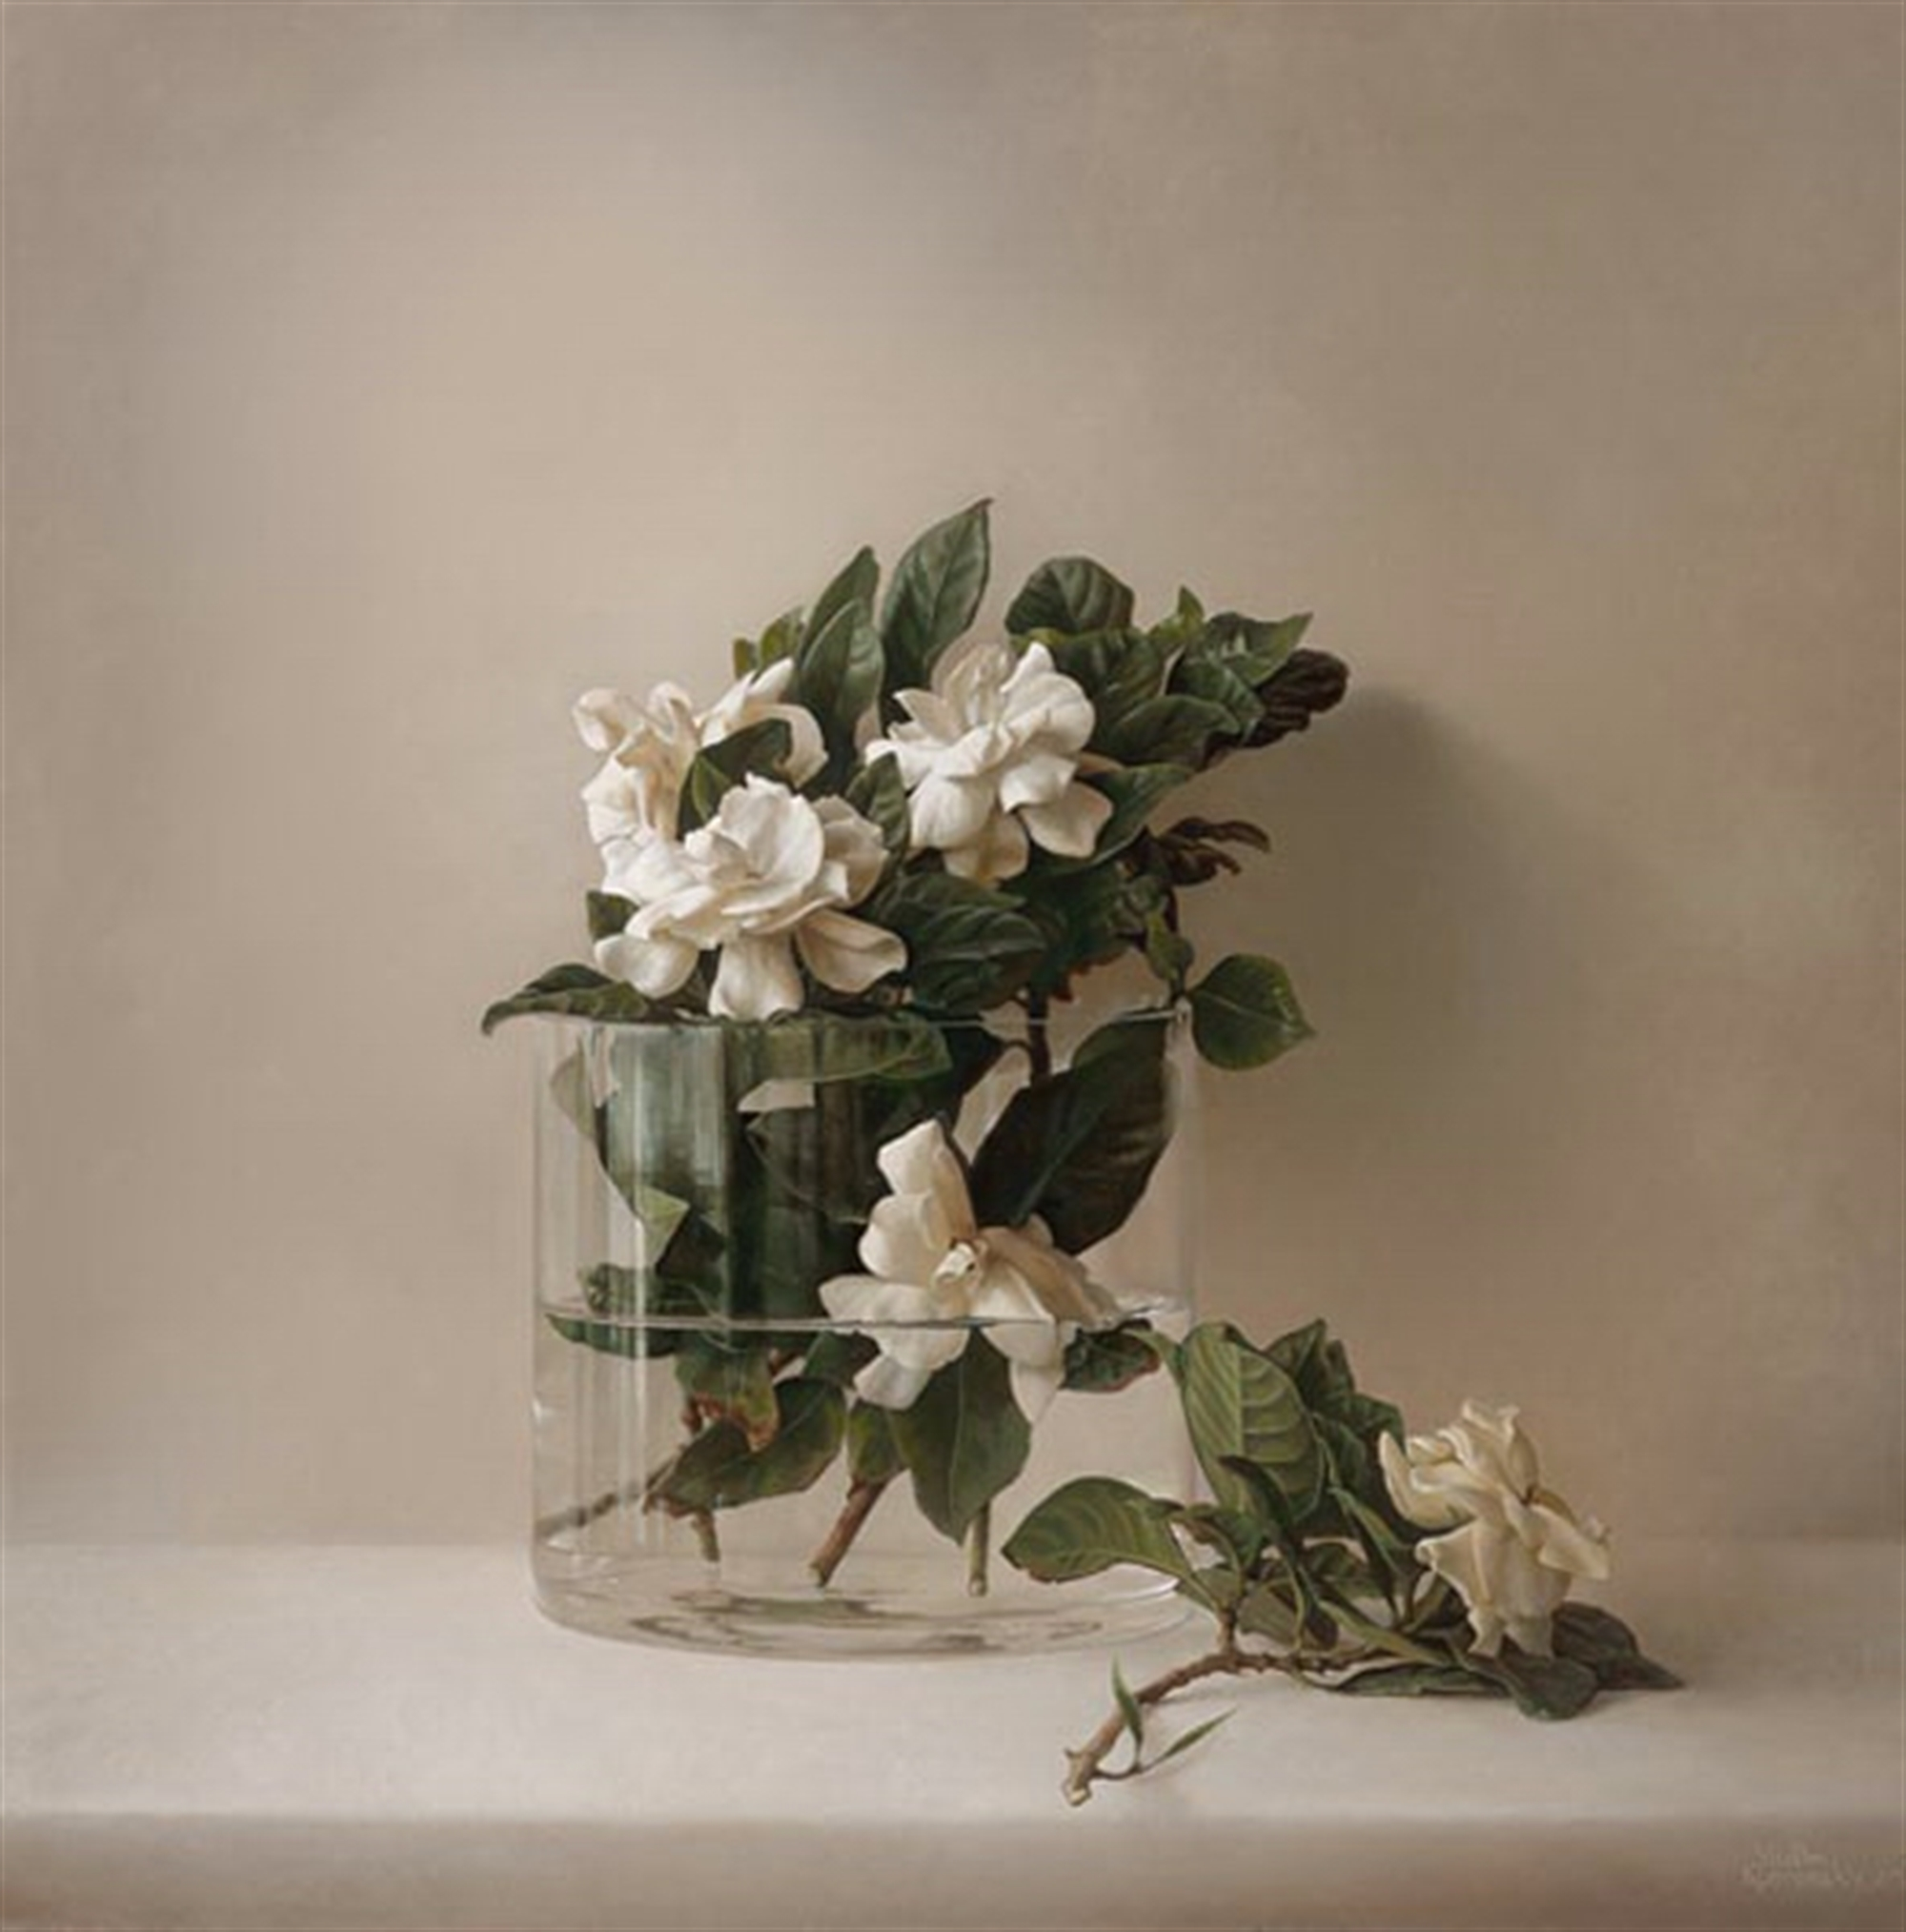 August Beauty by Vadim Klevenskiy